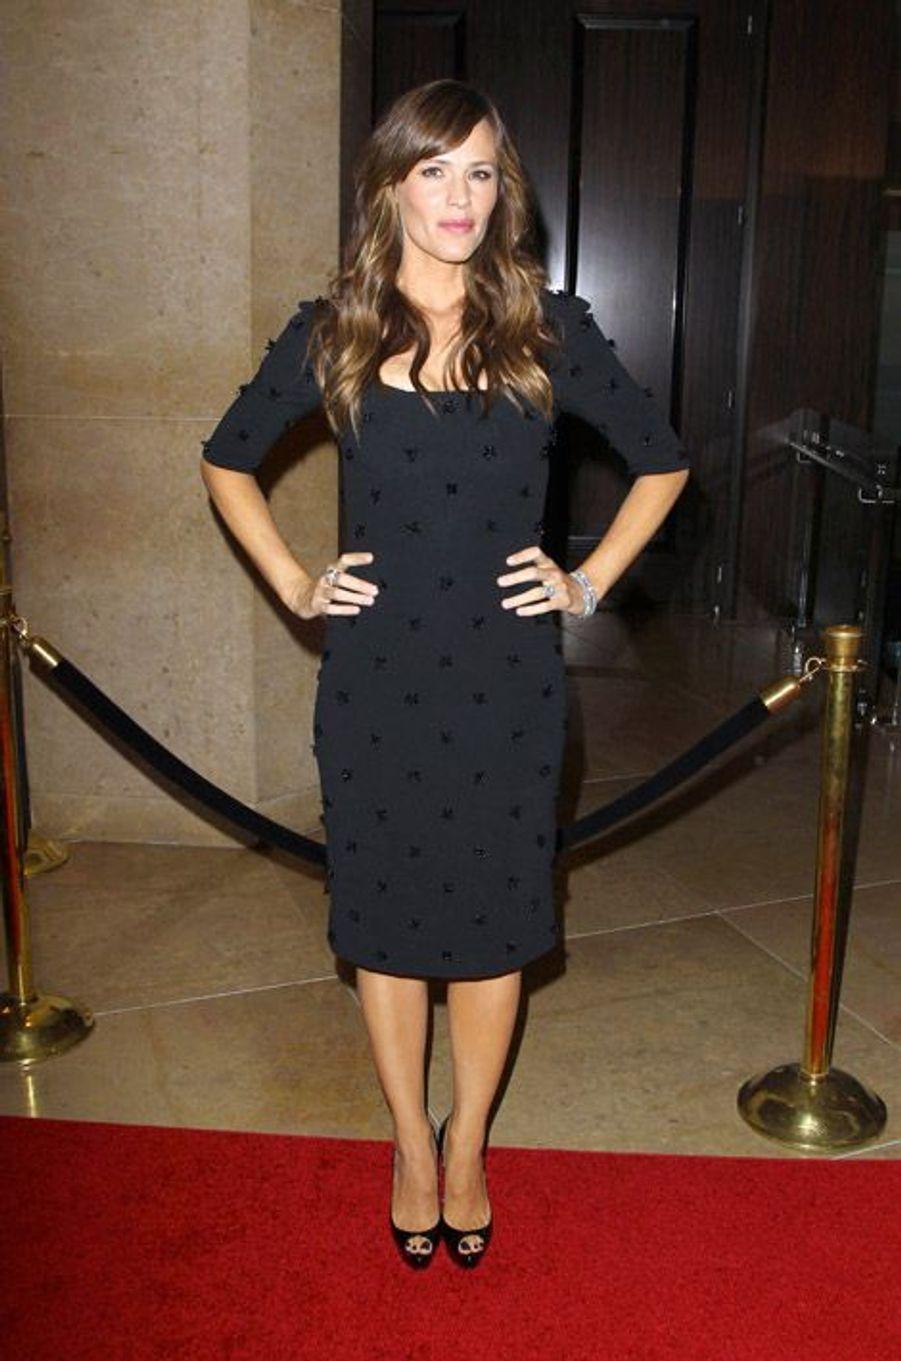 L'actrice Jennifer Garner, 42 ans, lors des American Cinematheque Award en l'honneur de Matthew McConaughey